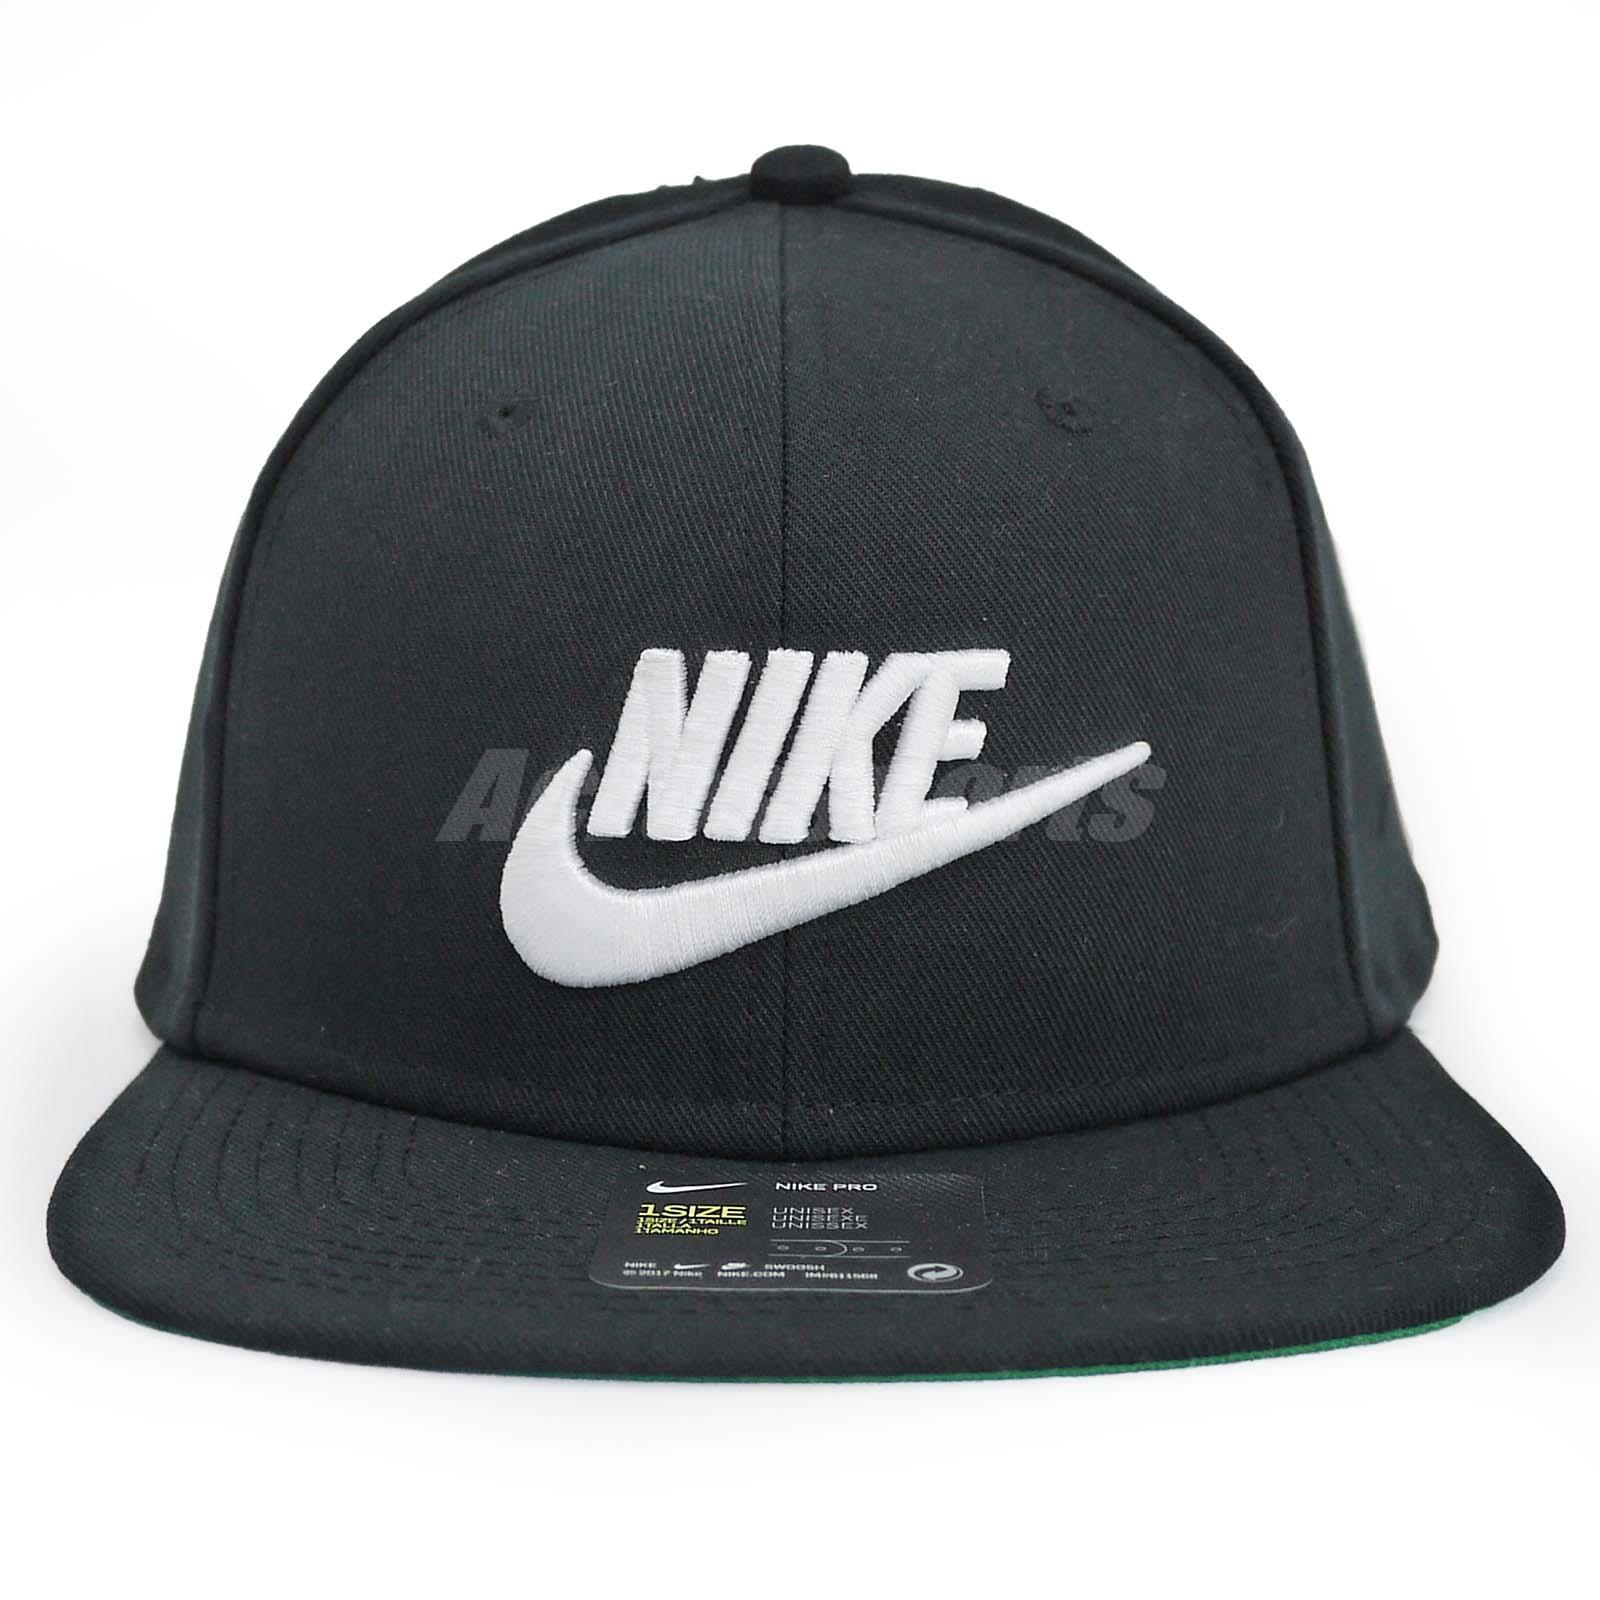 Nike Unisex NSW Pro Cap Futura Snapback Hat Sport Running Black ... d5b6dfec8279